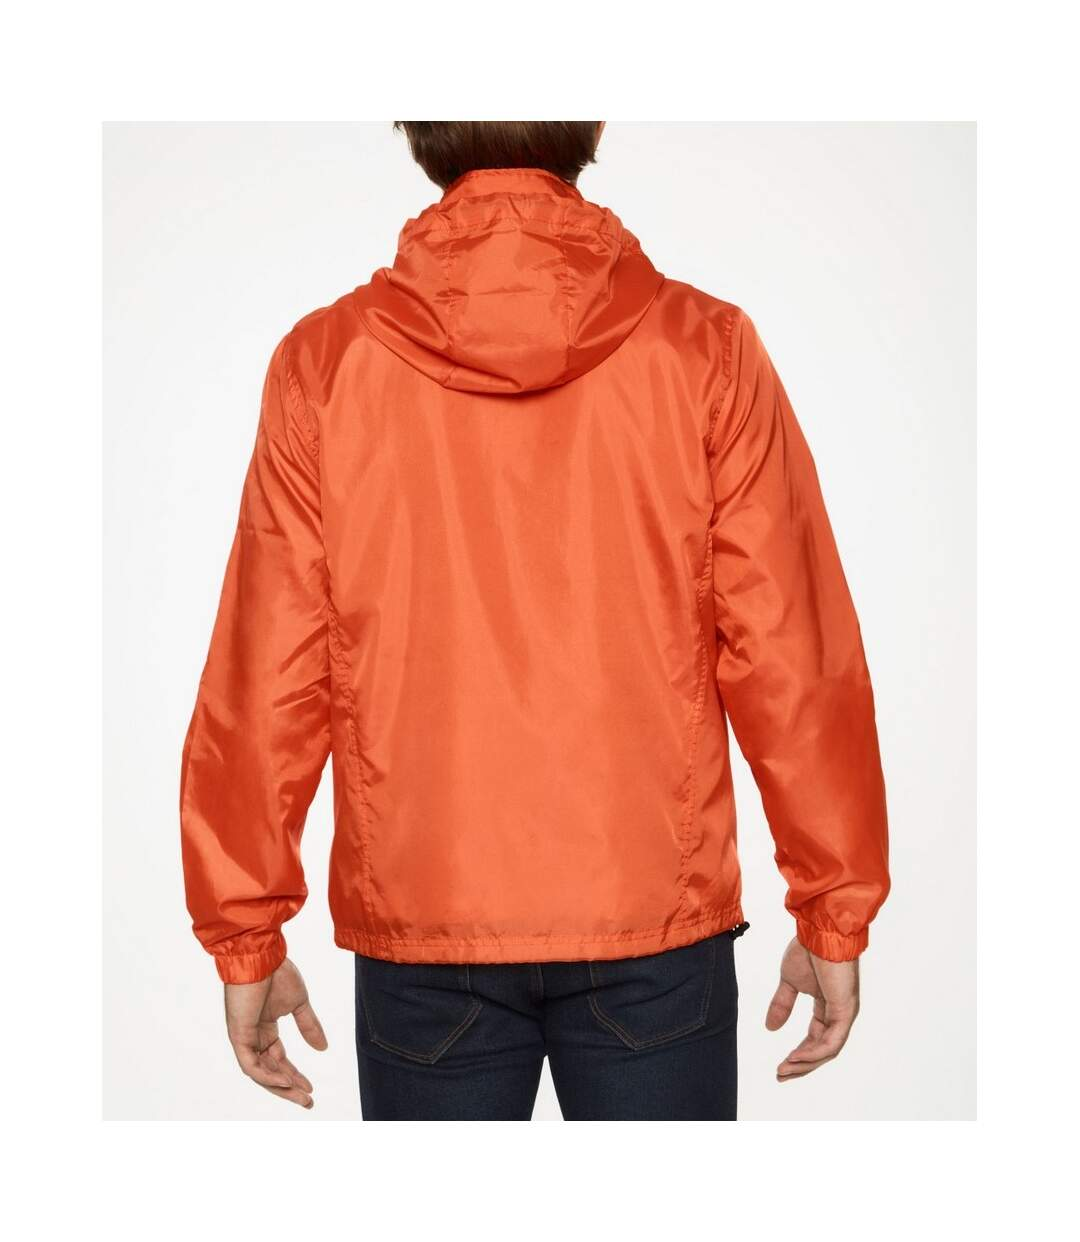 Gildan Mens Hammer Windwear Jacket (Orange) - UTPC3988